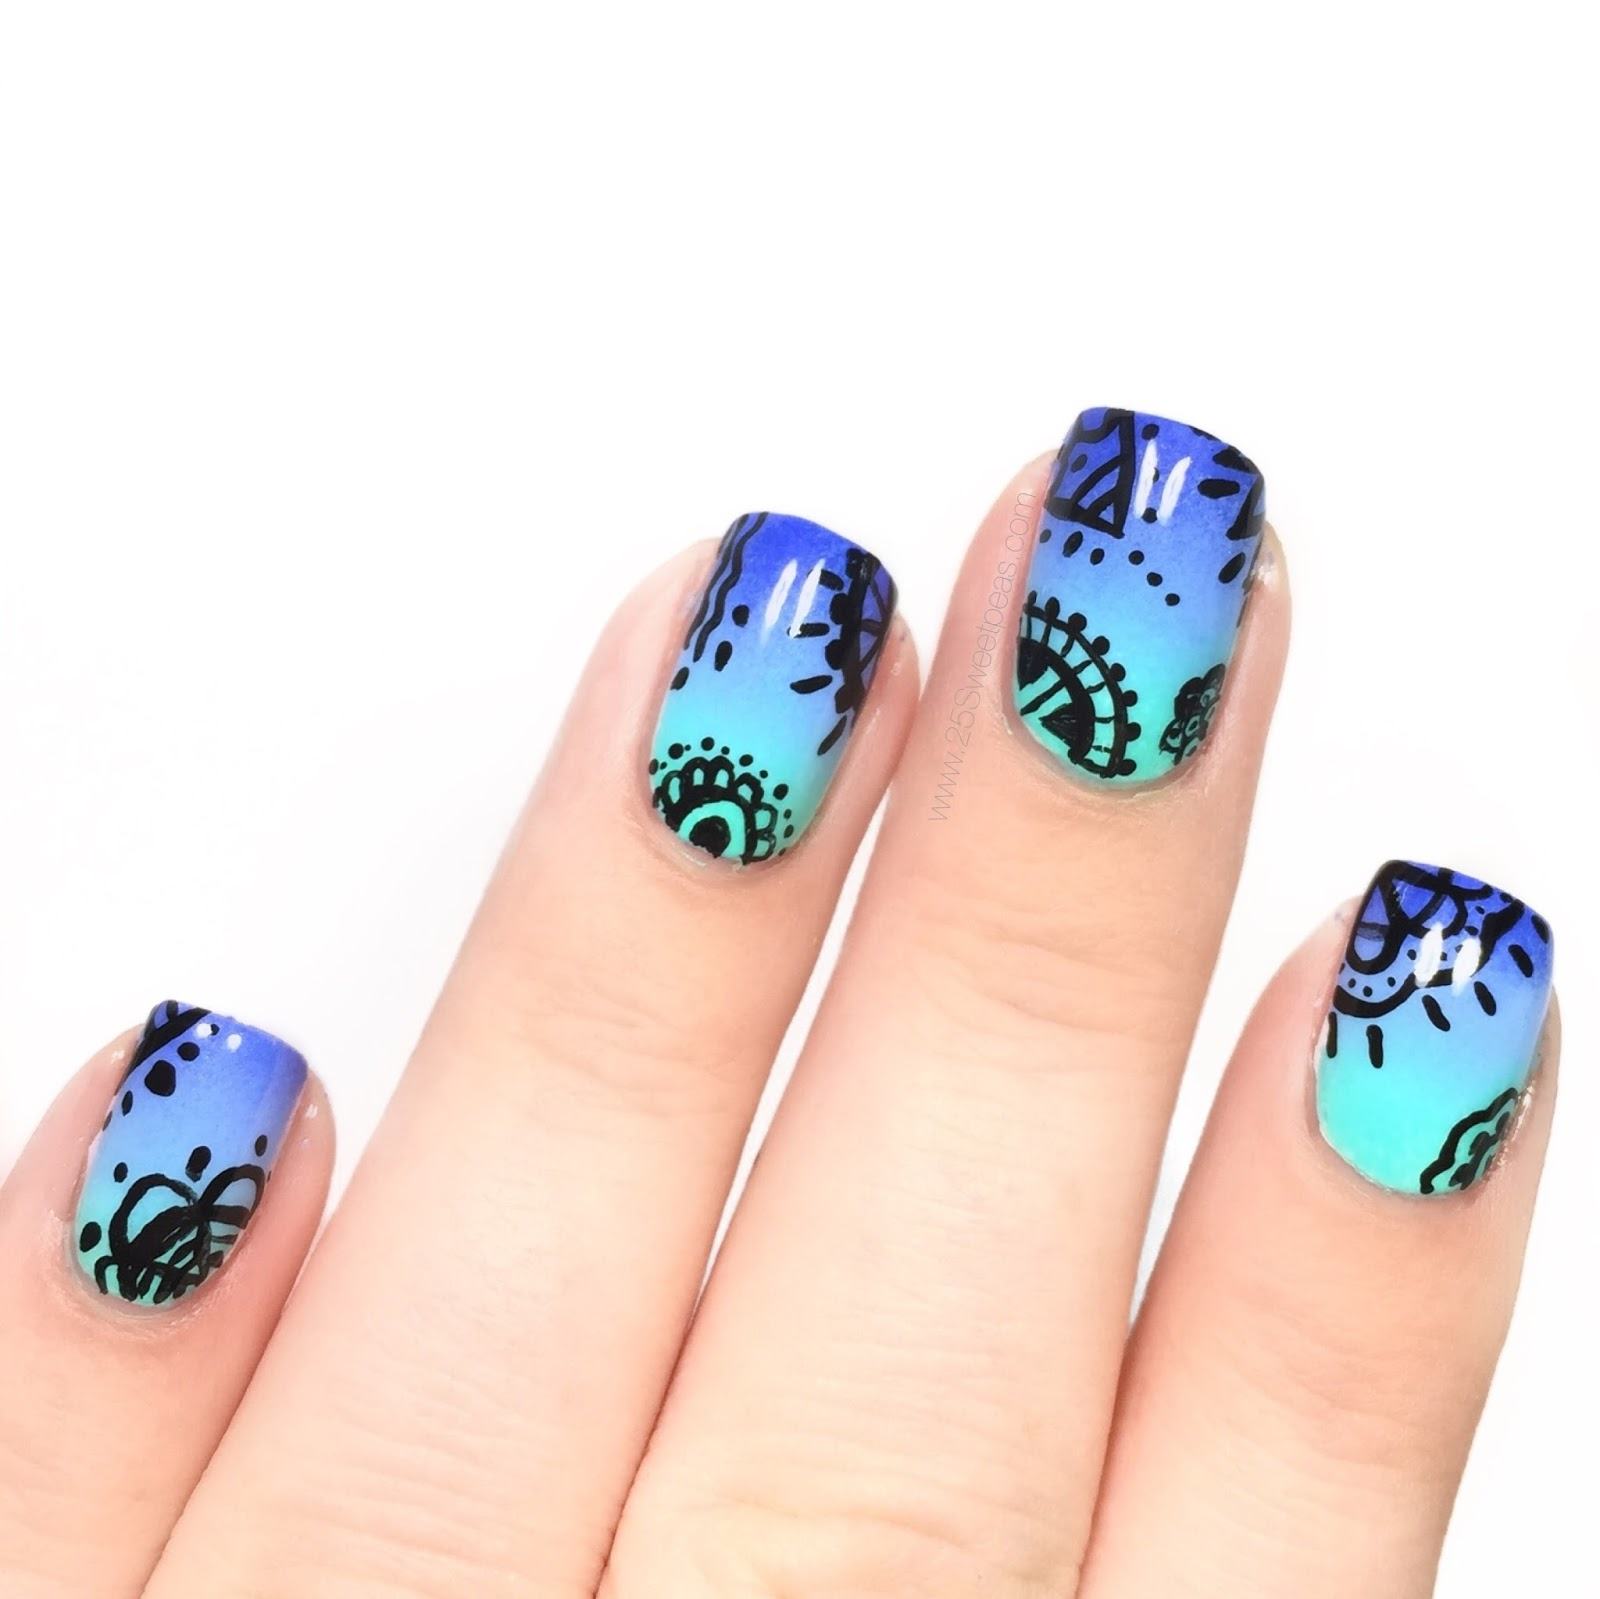 Gradation nails